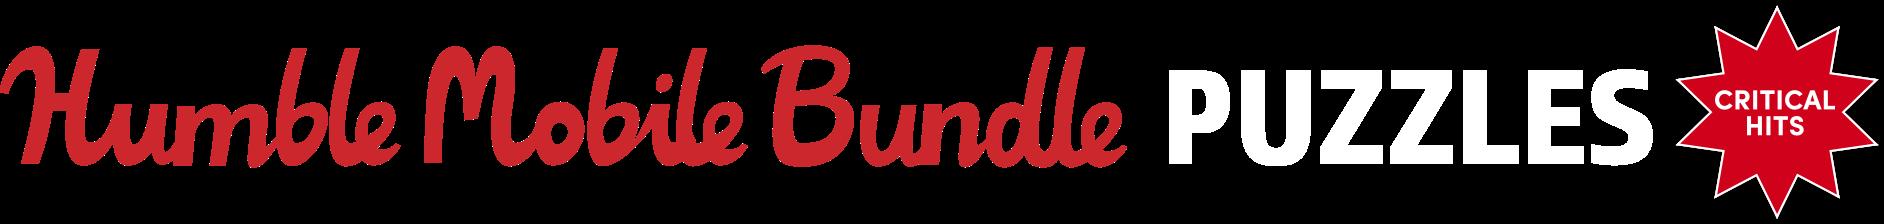 The Humble Mobile Bundle: Puzzles (Critical Hits)